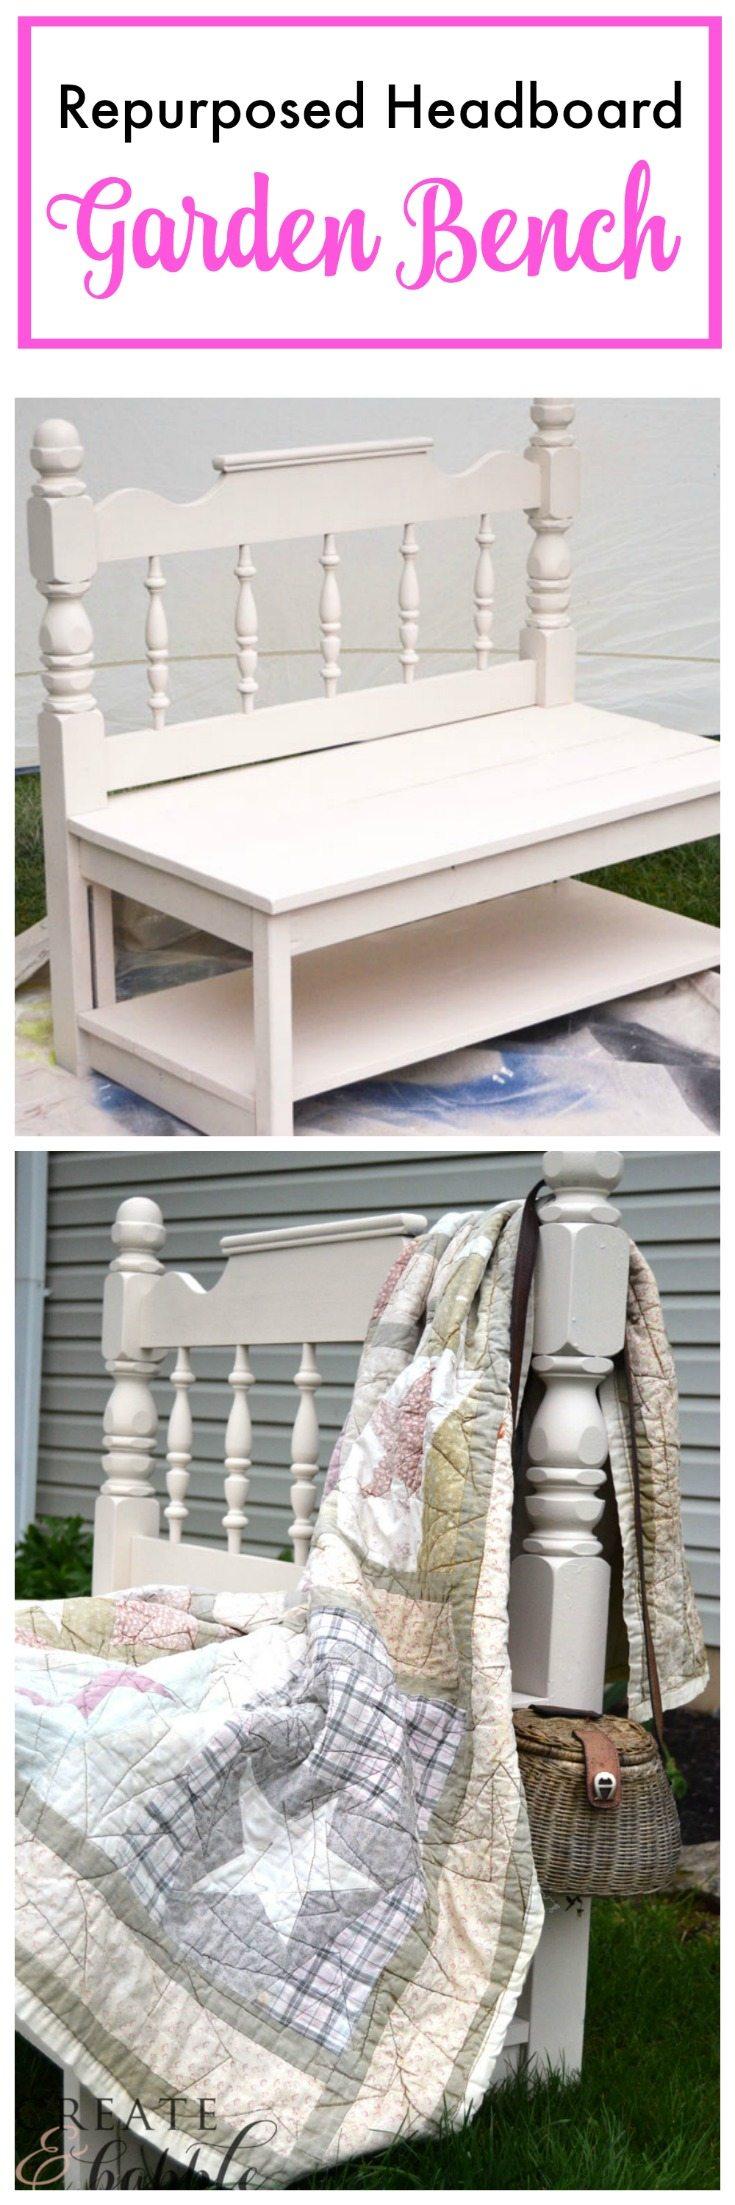 repurposed-headboard-into-garden-bench-1